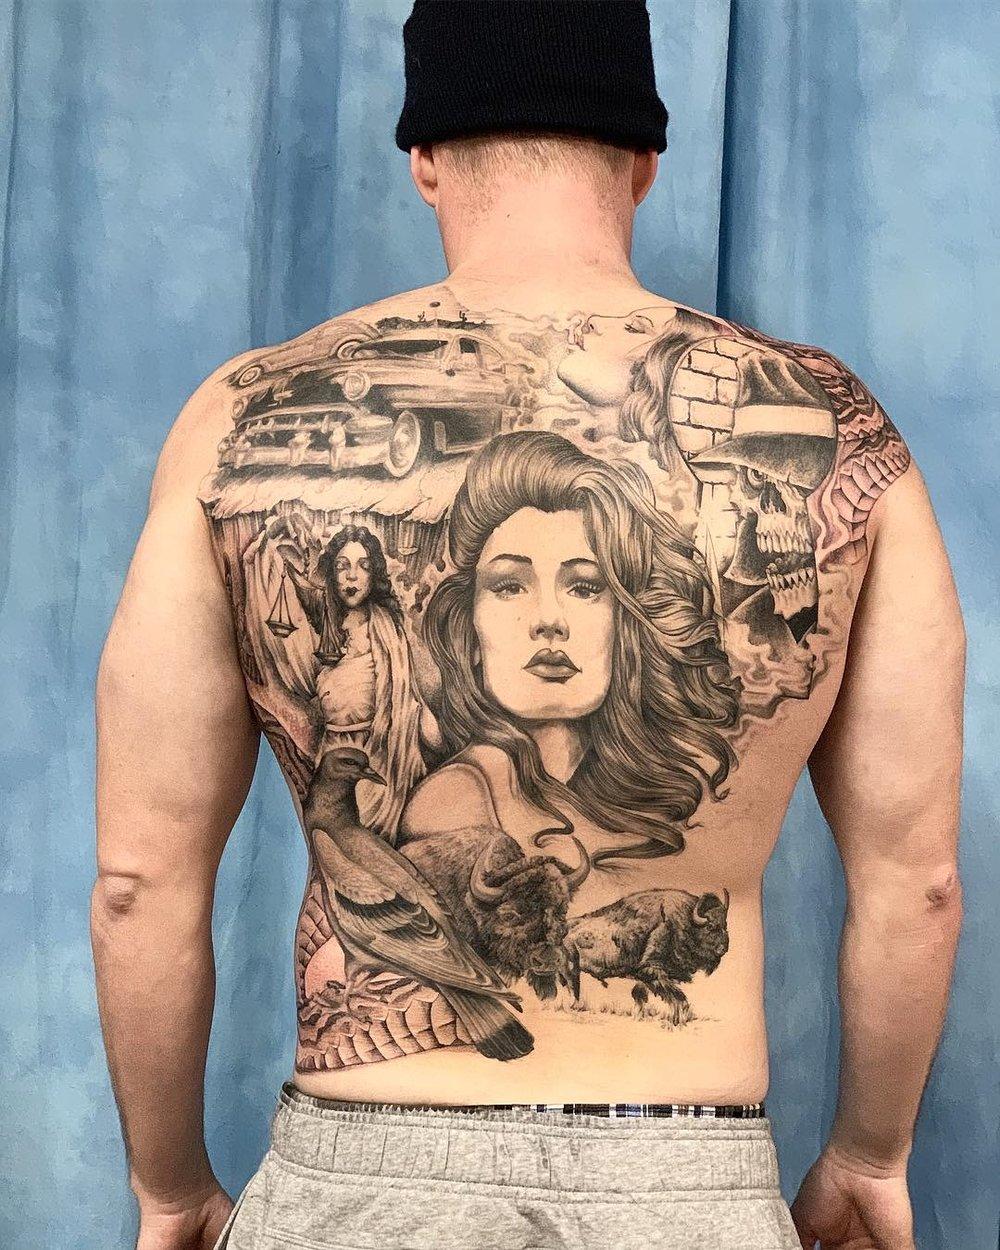 Duncan-Lemmon-Fun-City-Tattoo-2.jpg